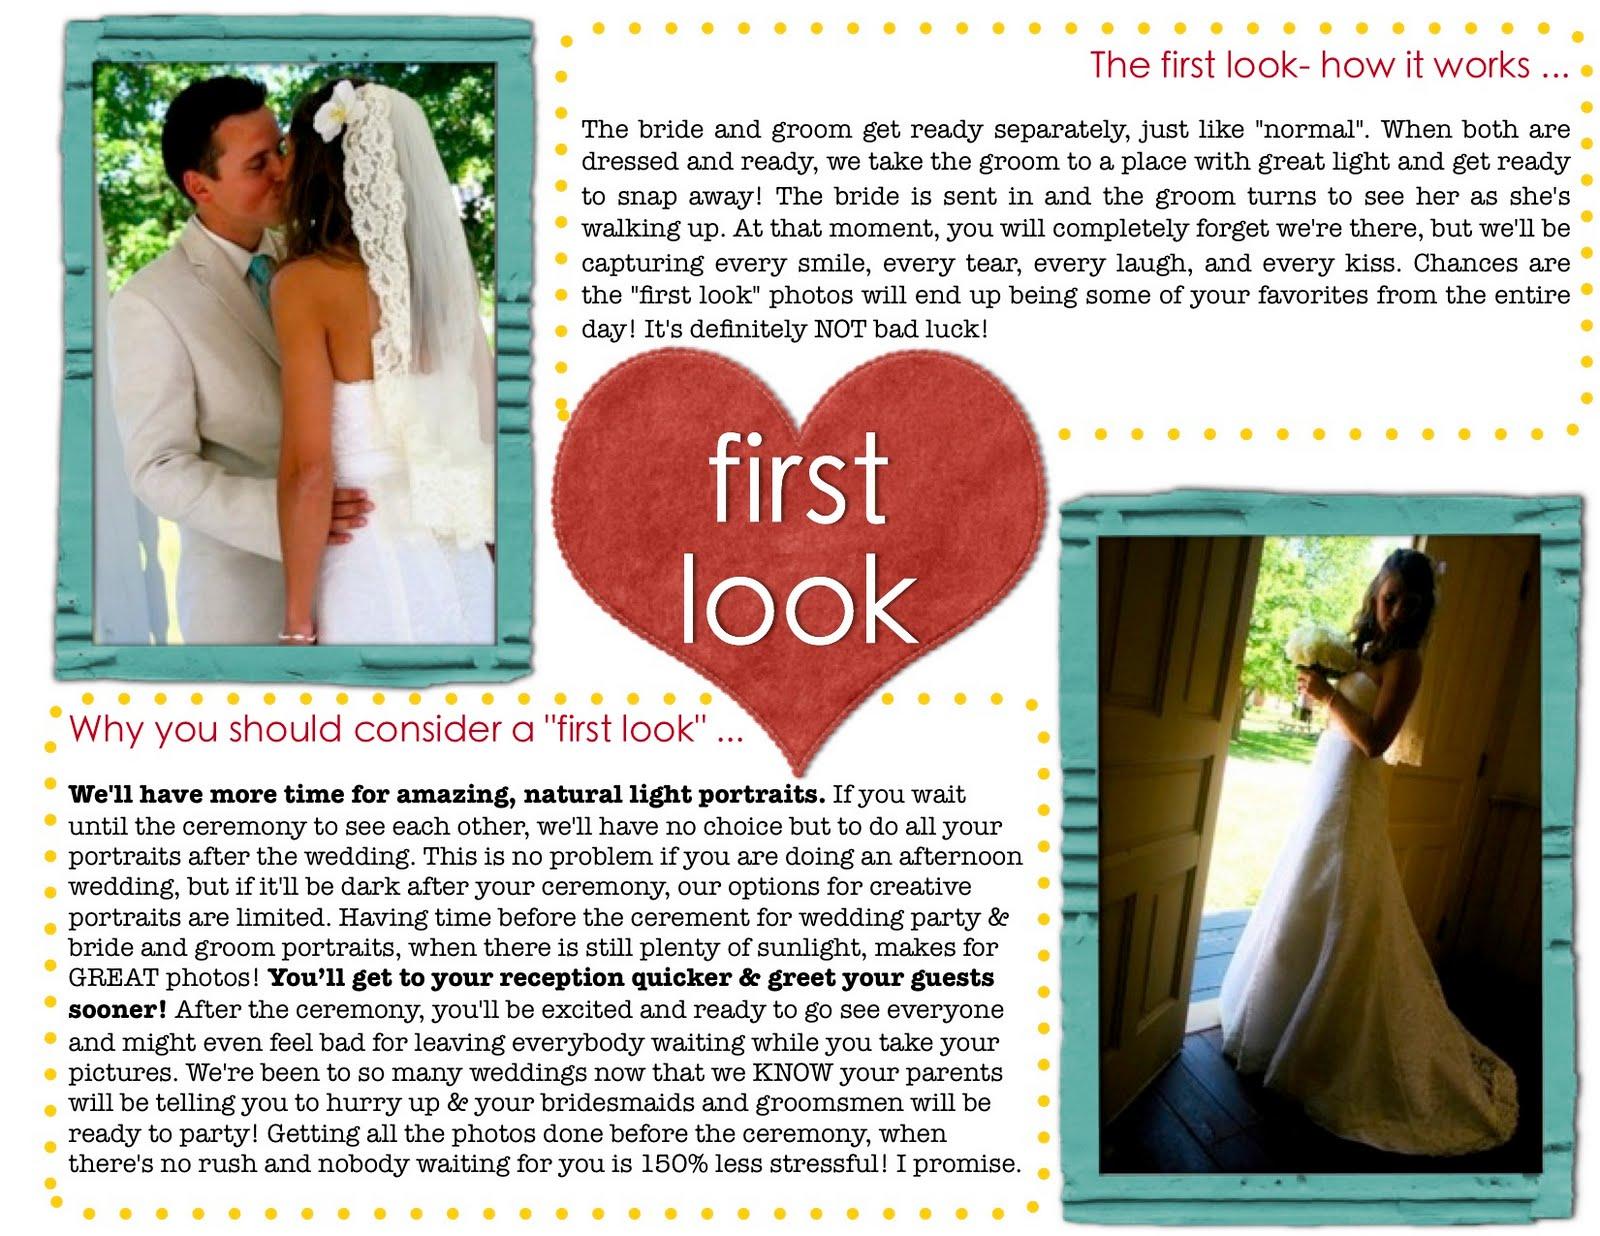 [Wedding+Marketing+7.jpg]